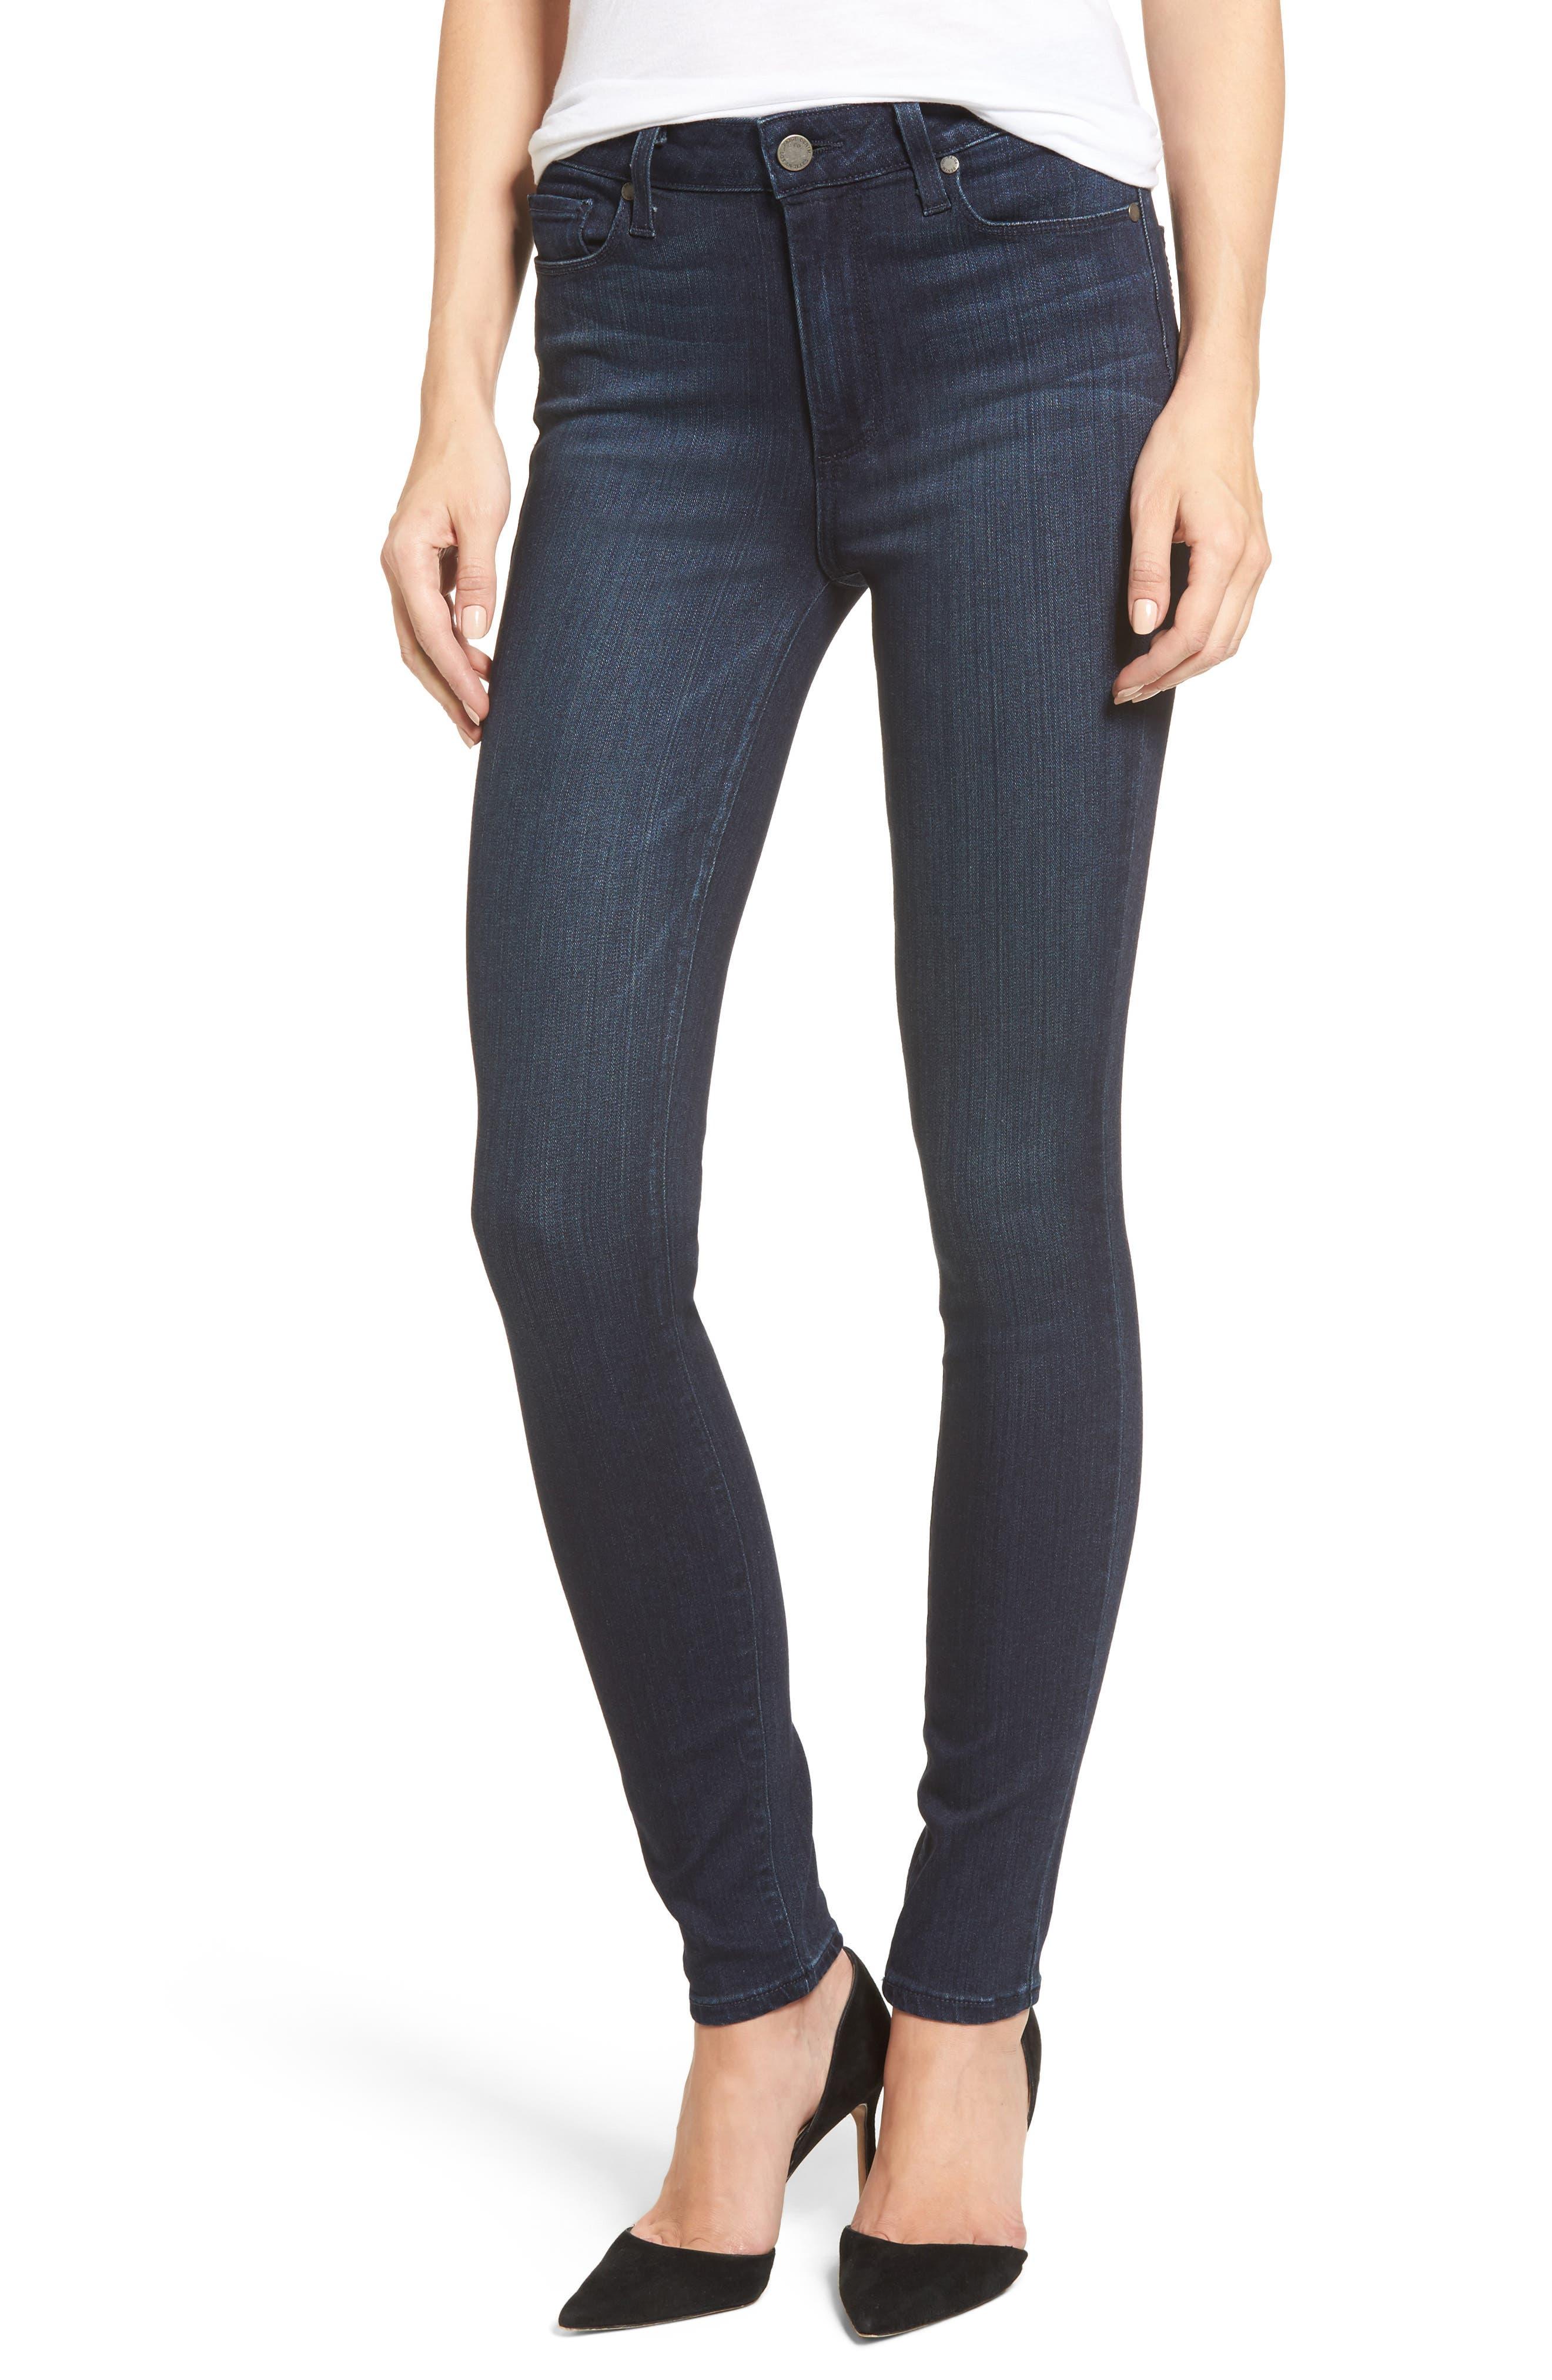 PAIGE Transcend - Hoxton High Waist Ultra Skinny Jeans (Midlake)